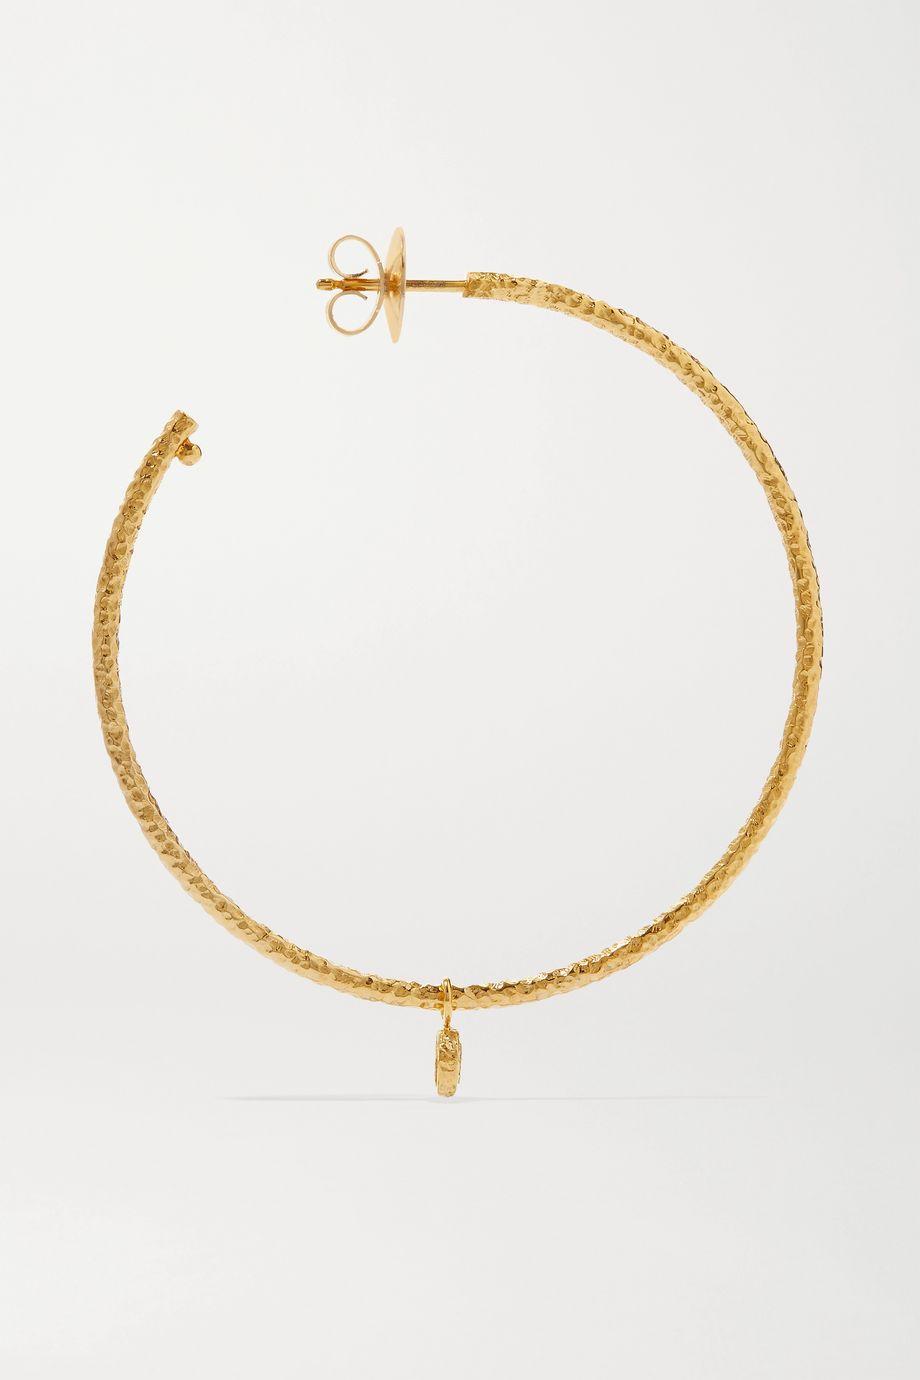 Octavia Elizabeth + NET SUSTAIN Nesting Gem 18-karat recycled gold diamond hoop earrings